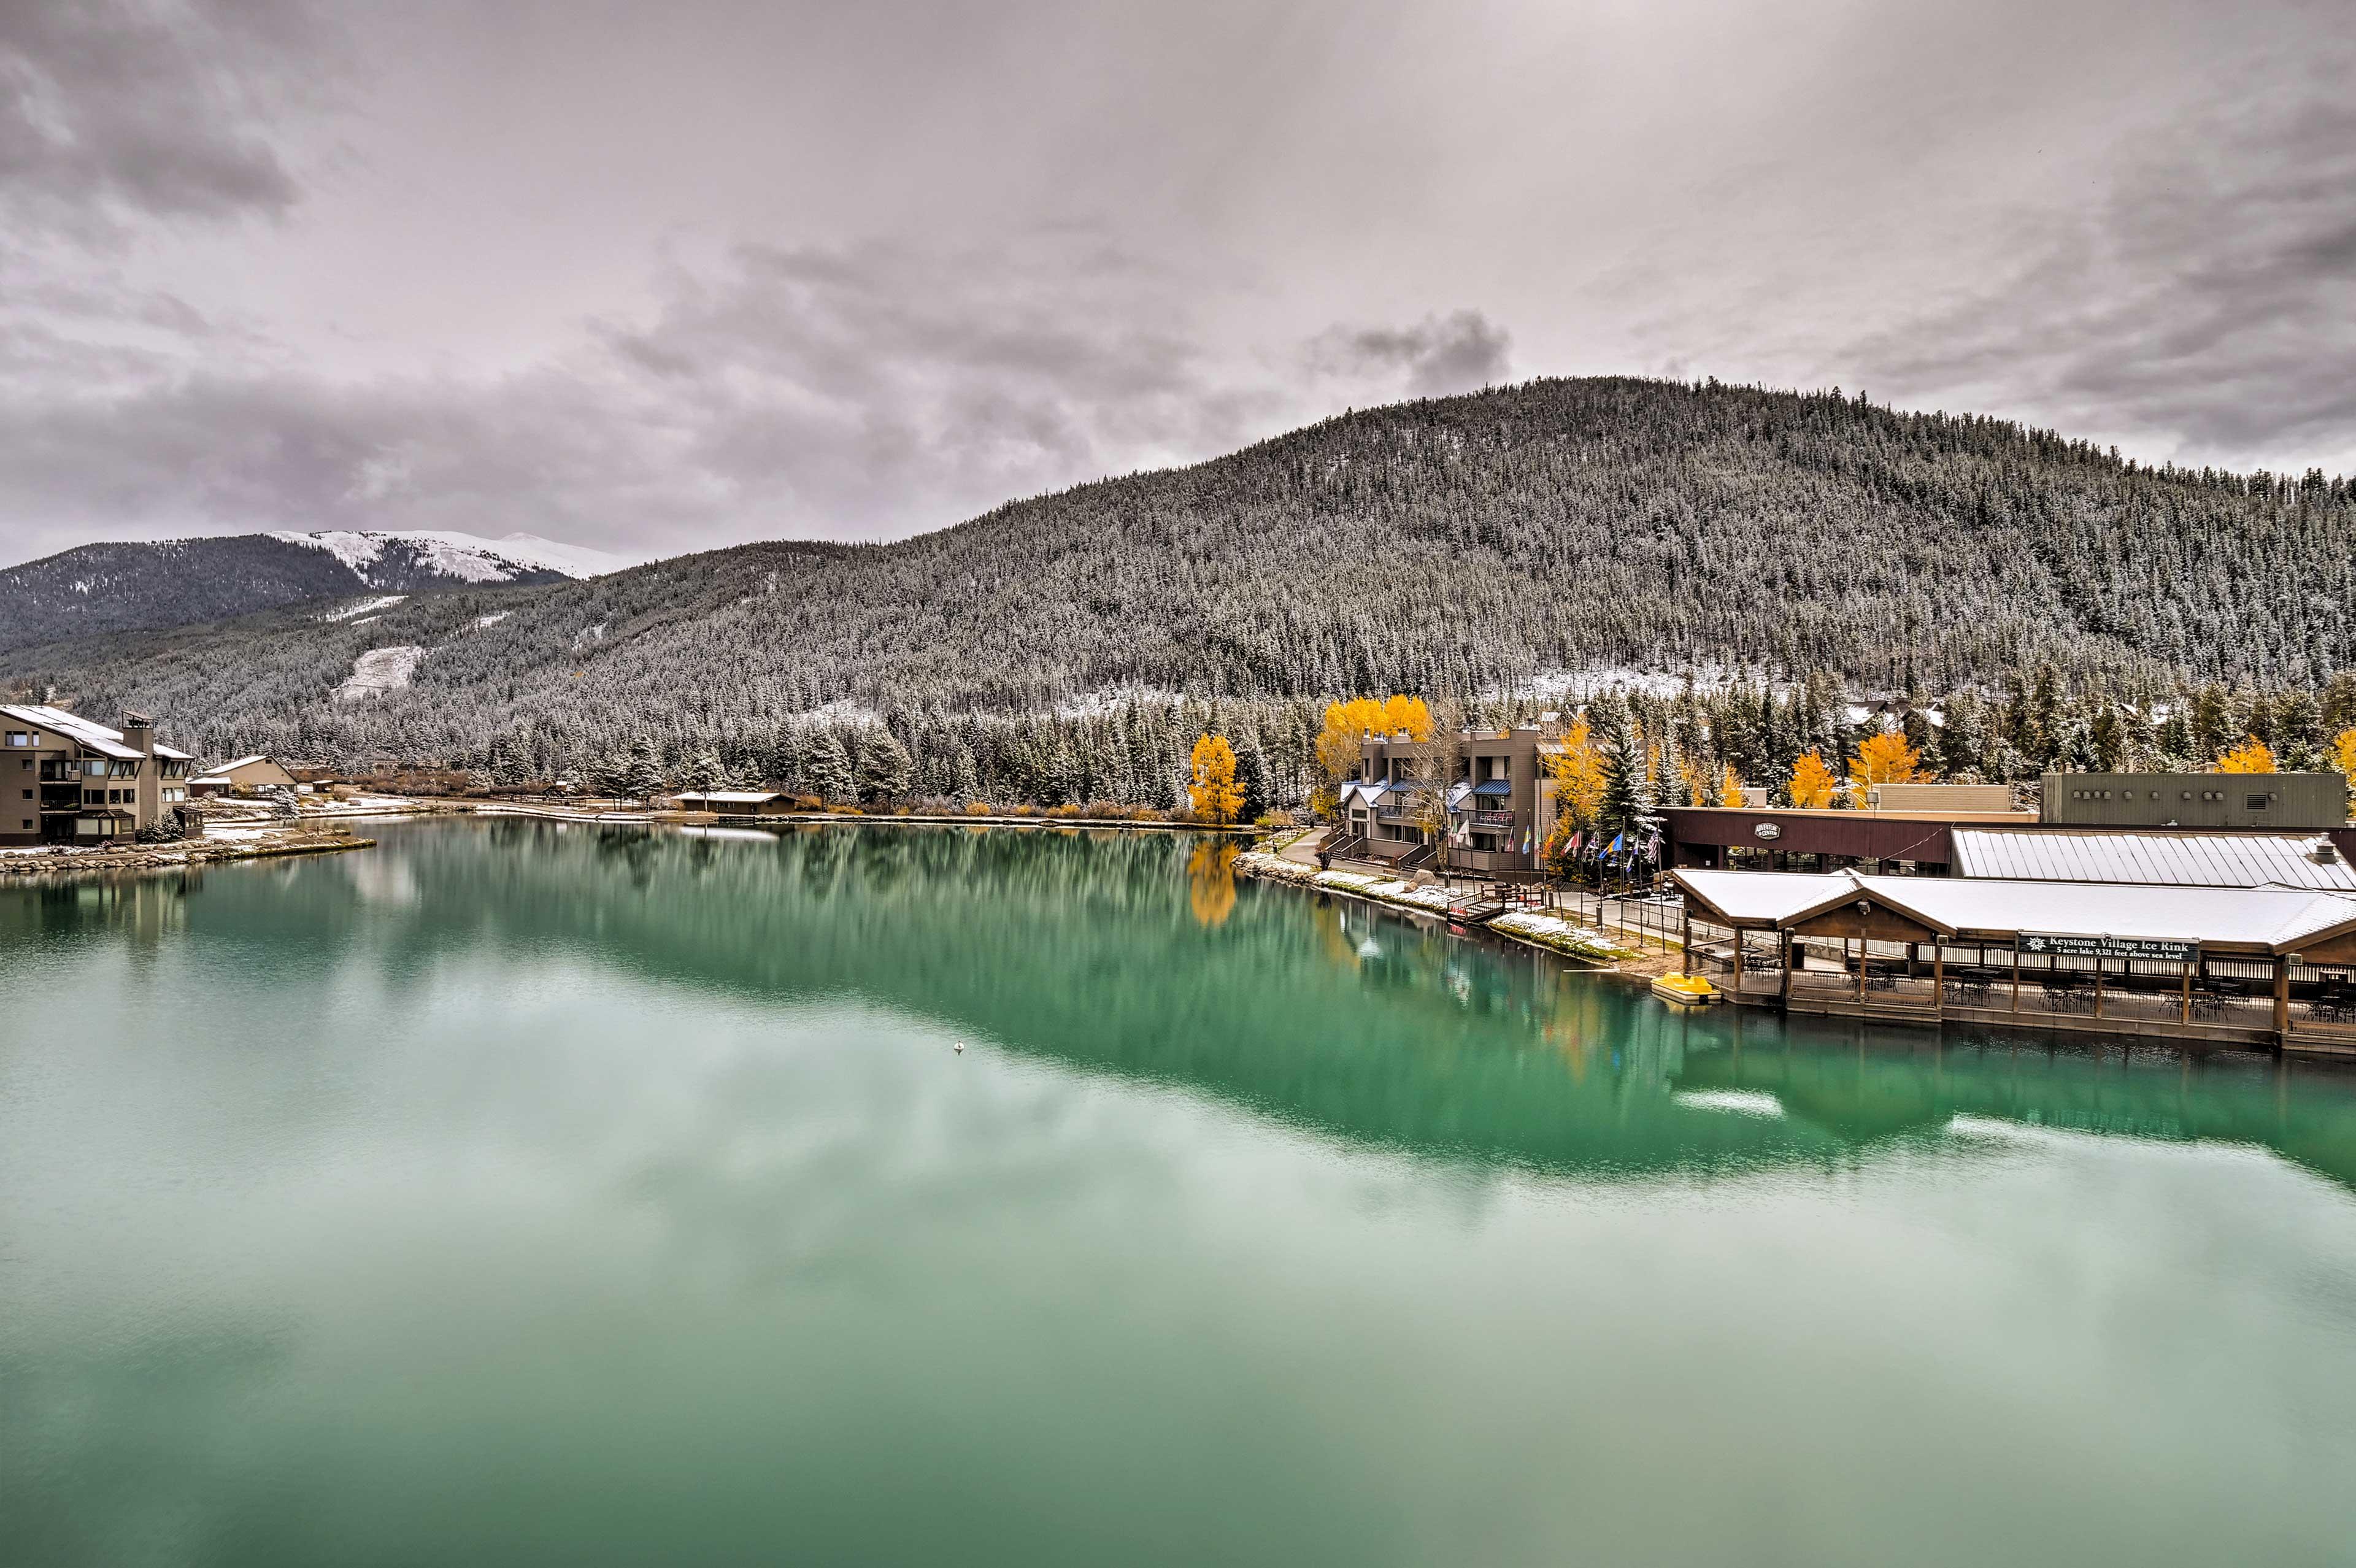 Enjoy a getaway at this Lakeside Village vacation rental on Keystone Lake!